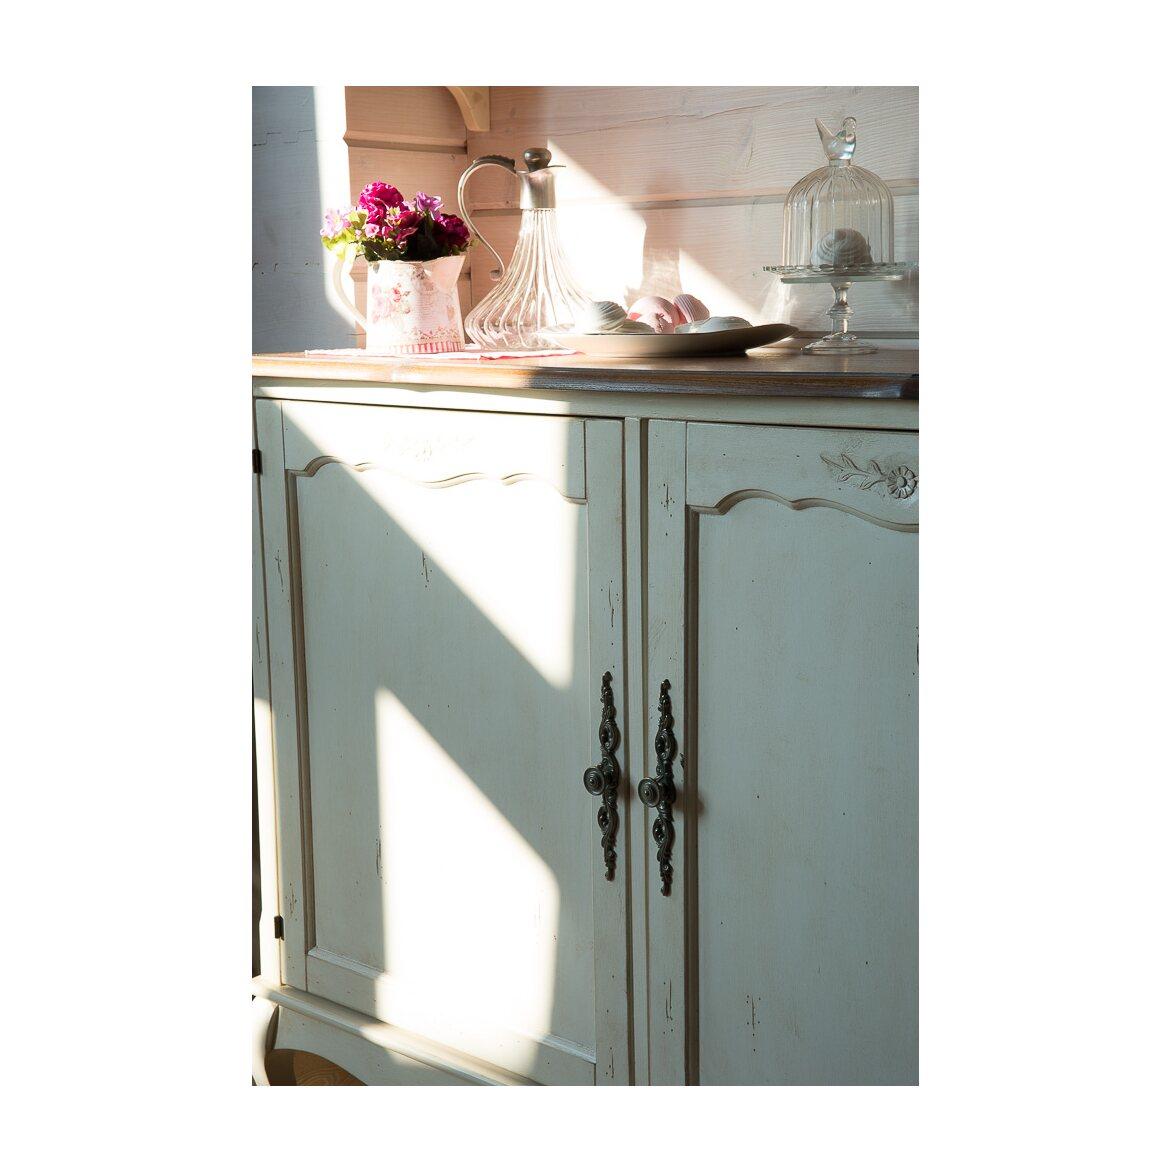 Буфет двухстворчатый Leontina, лавандового цвета 3 | Буфеты Kingsby